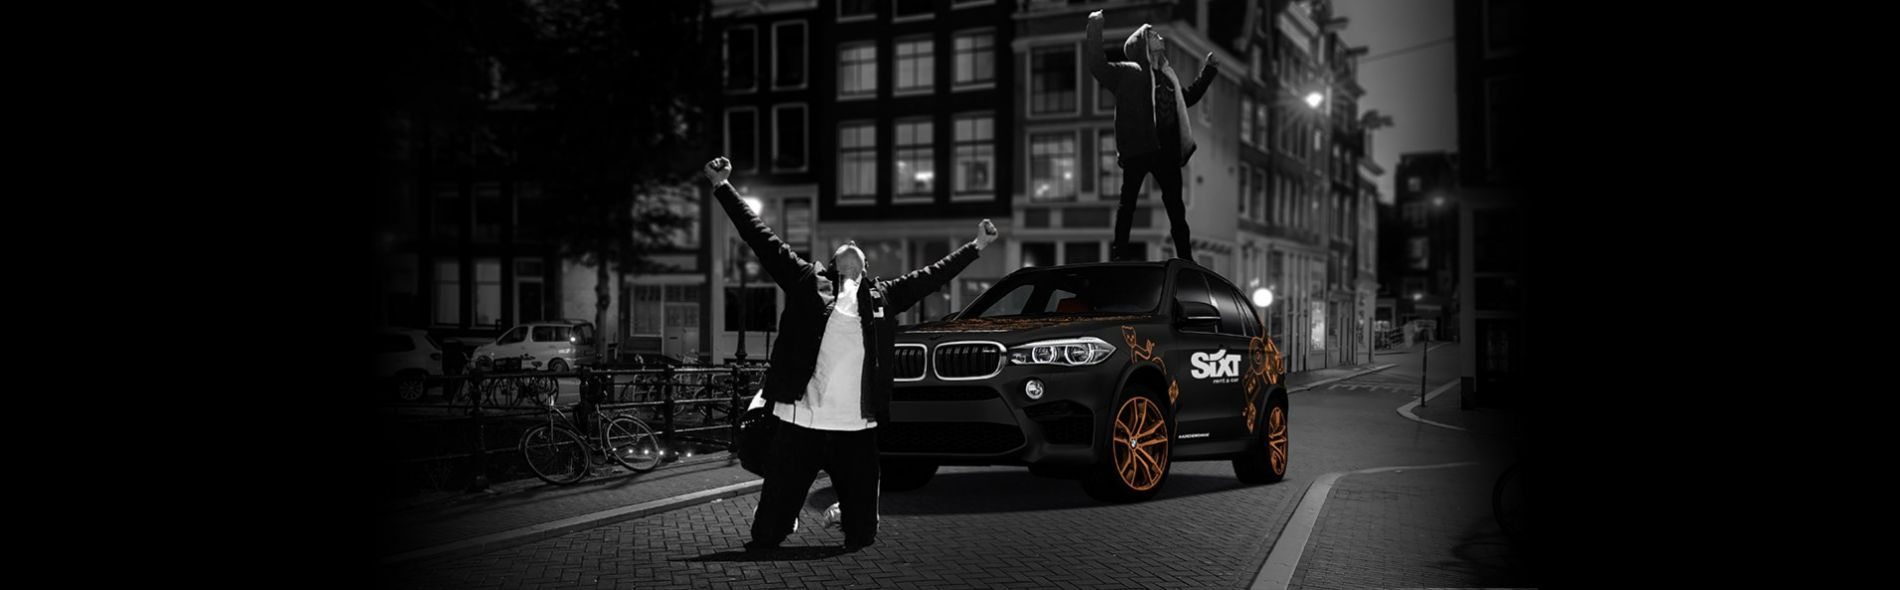 Sixt x Mr. Belt & Wezol's Demo ride